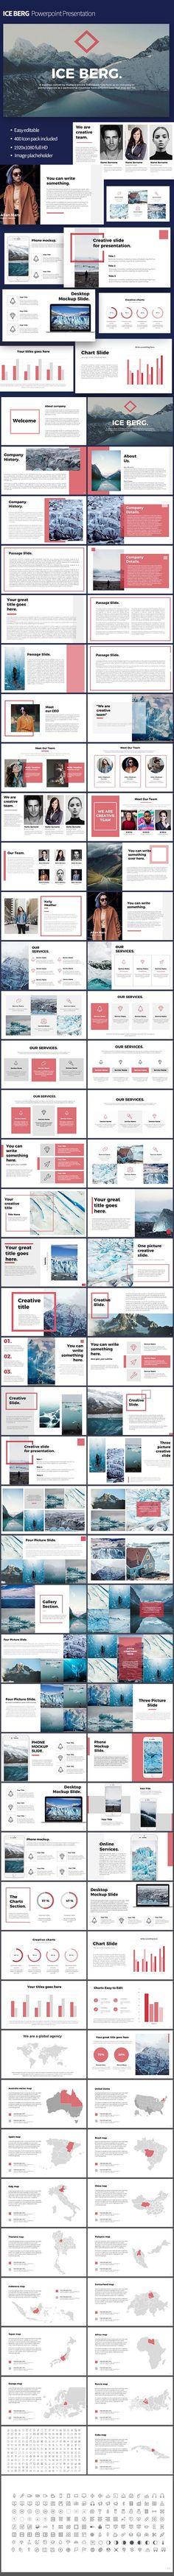 Ice Berg PowerPoint Templates Presentation Templates